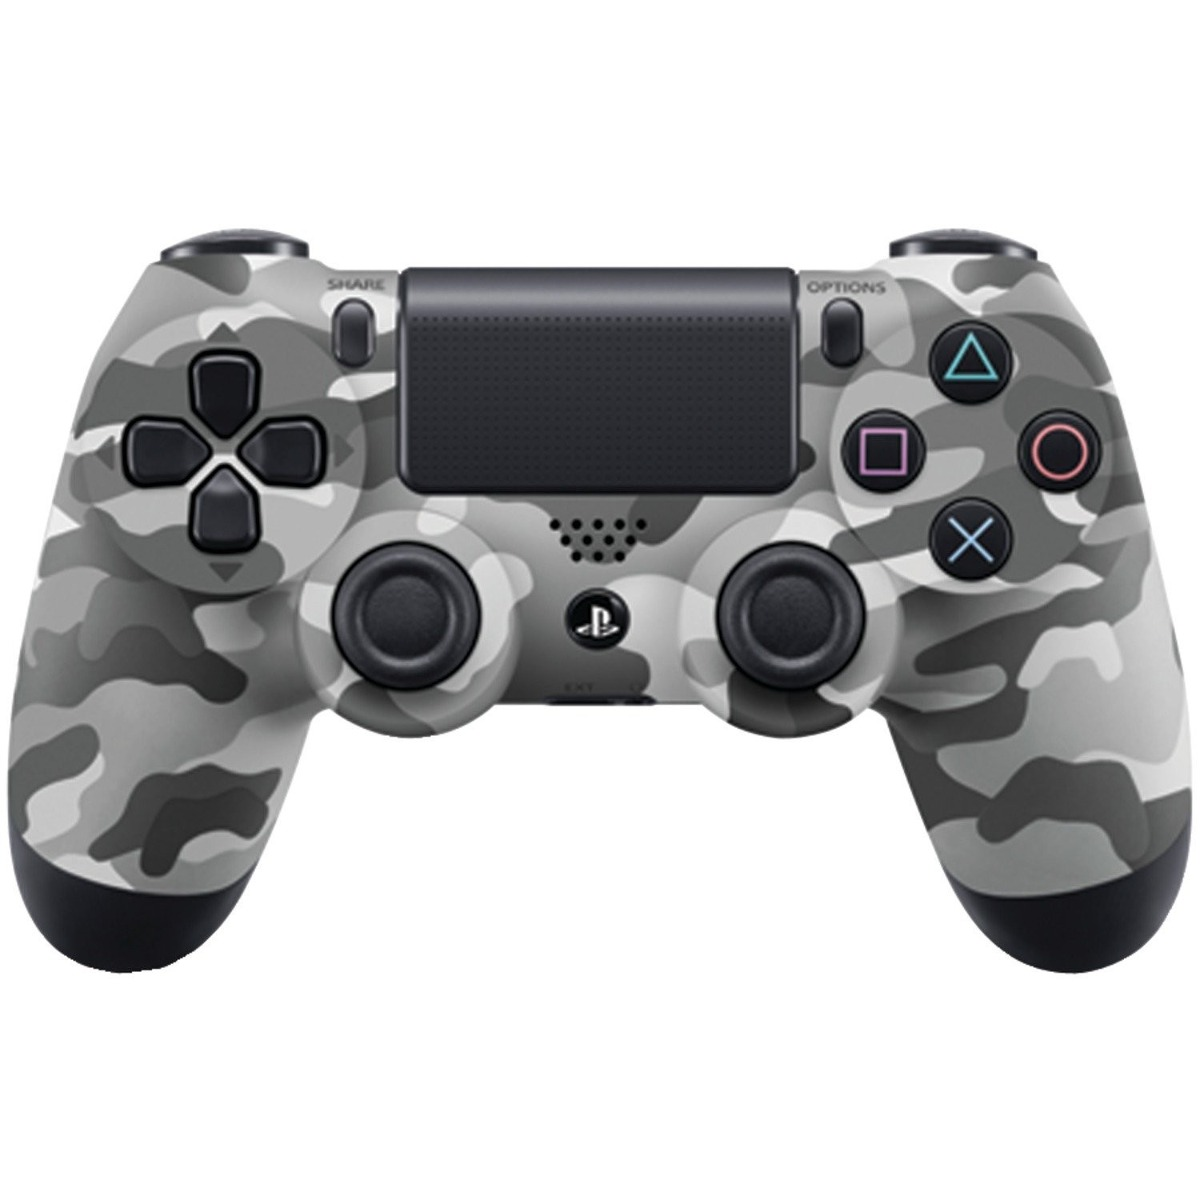 dualshock-4-control-inalambrico-playstation-4-camuflaje-urba-D_NQ_NP_20296-MLM20186109103_102014-F